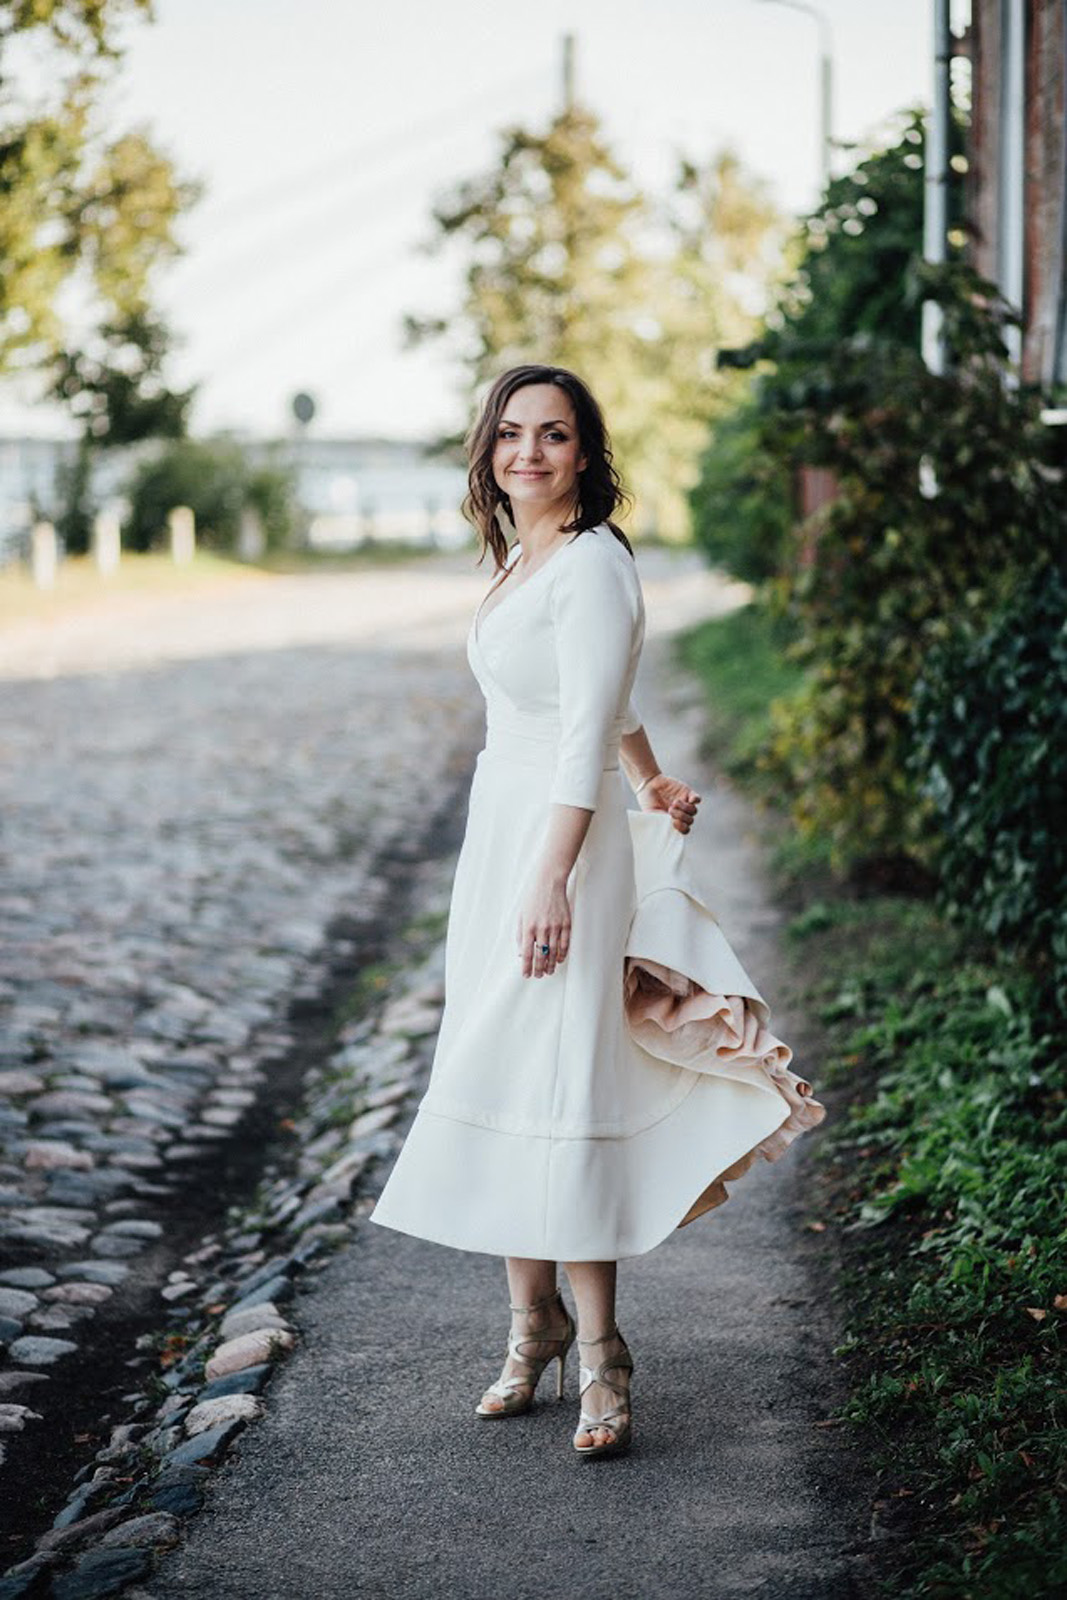 Liene no Rīgas